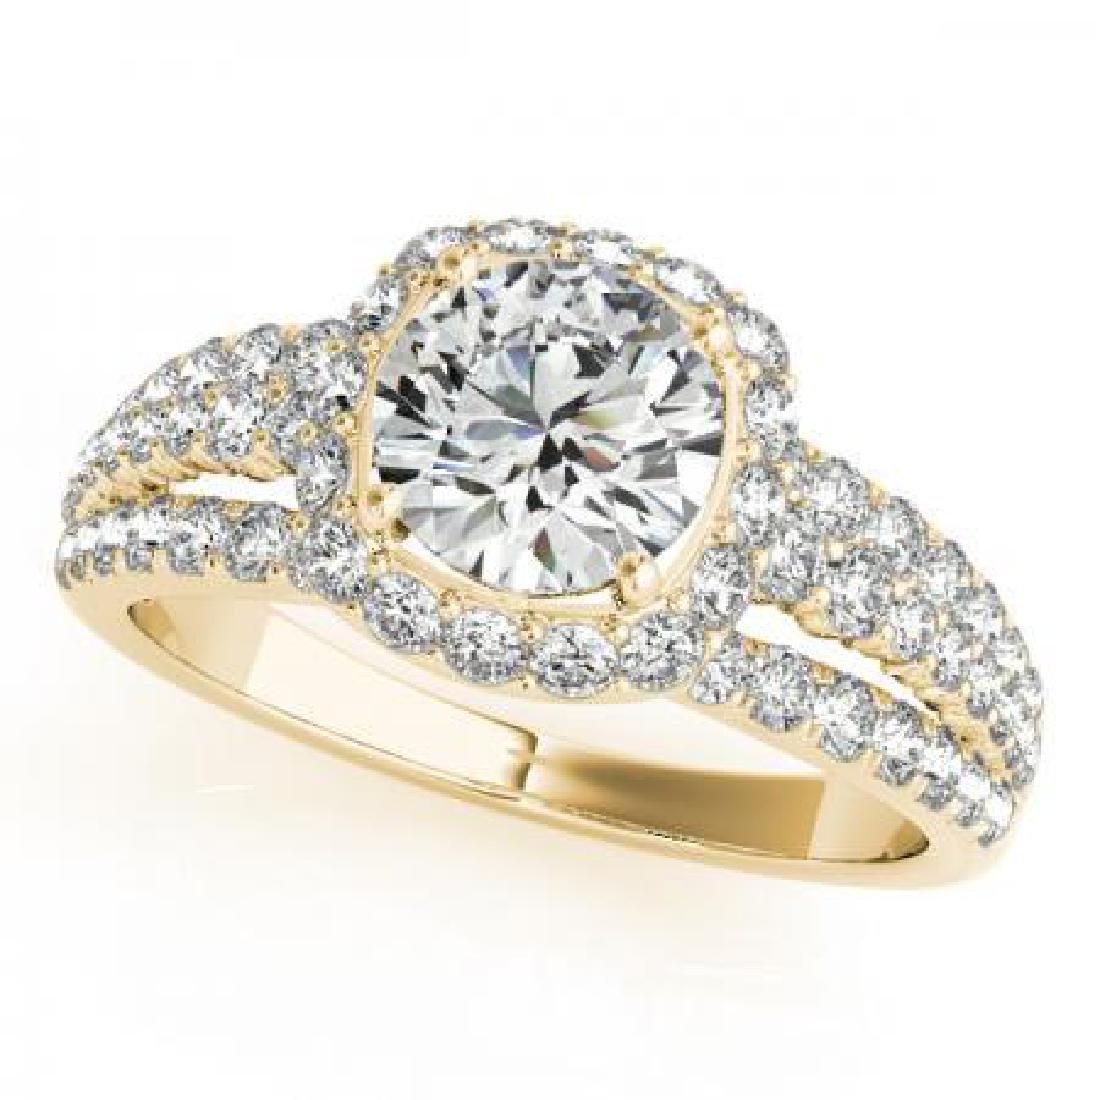 CERTIFIED 18K YELLOW GOLD 1.37 CT G-H/VS-SI1 DIAMOND HA